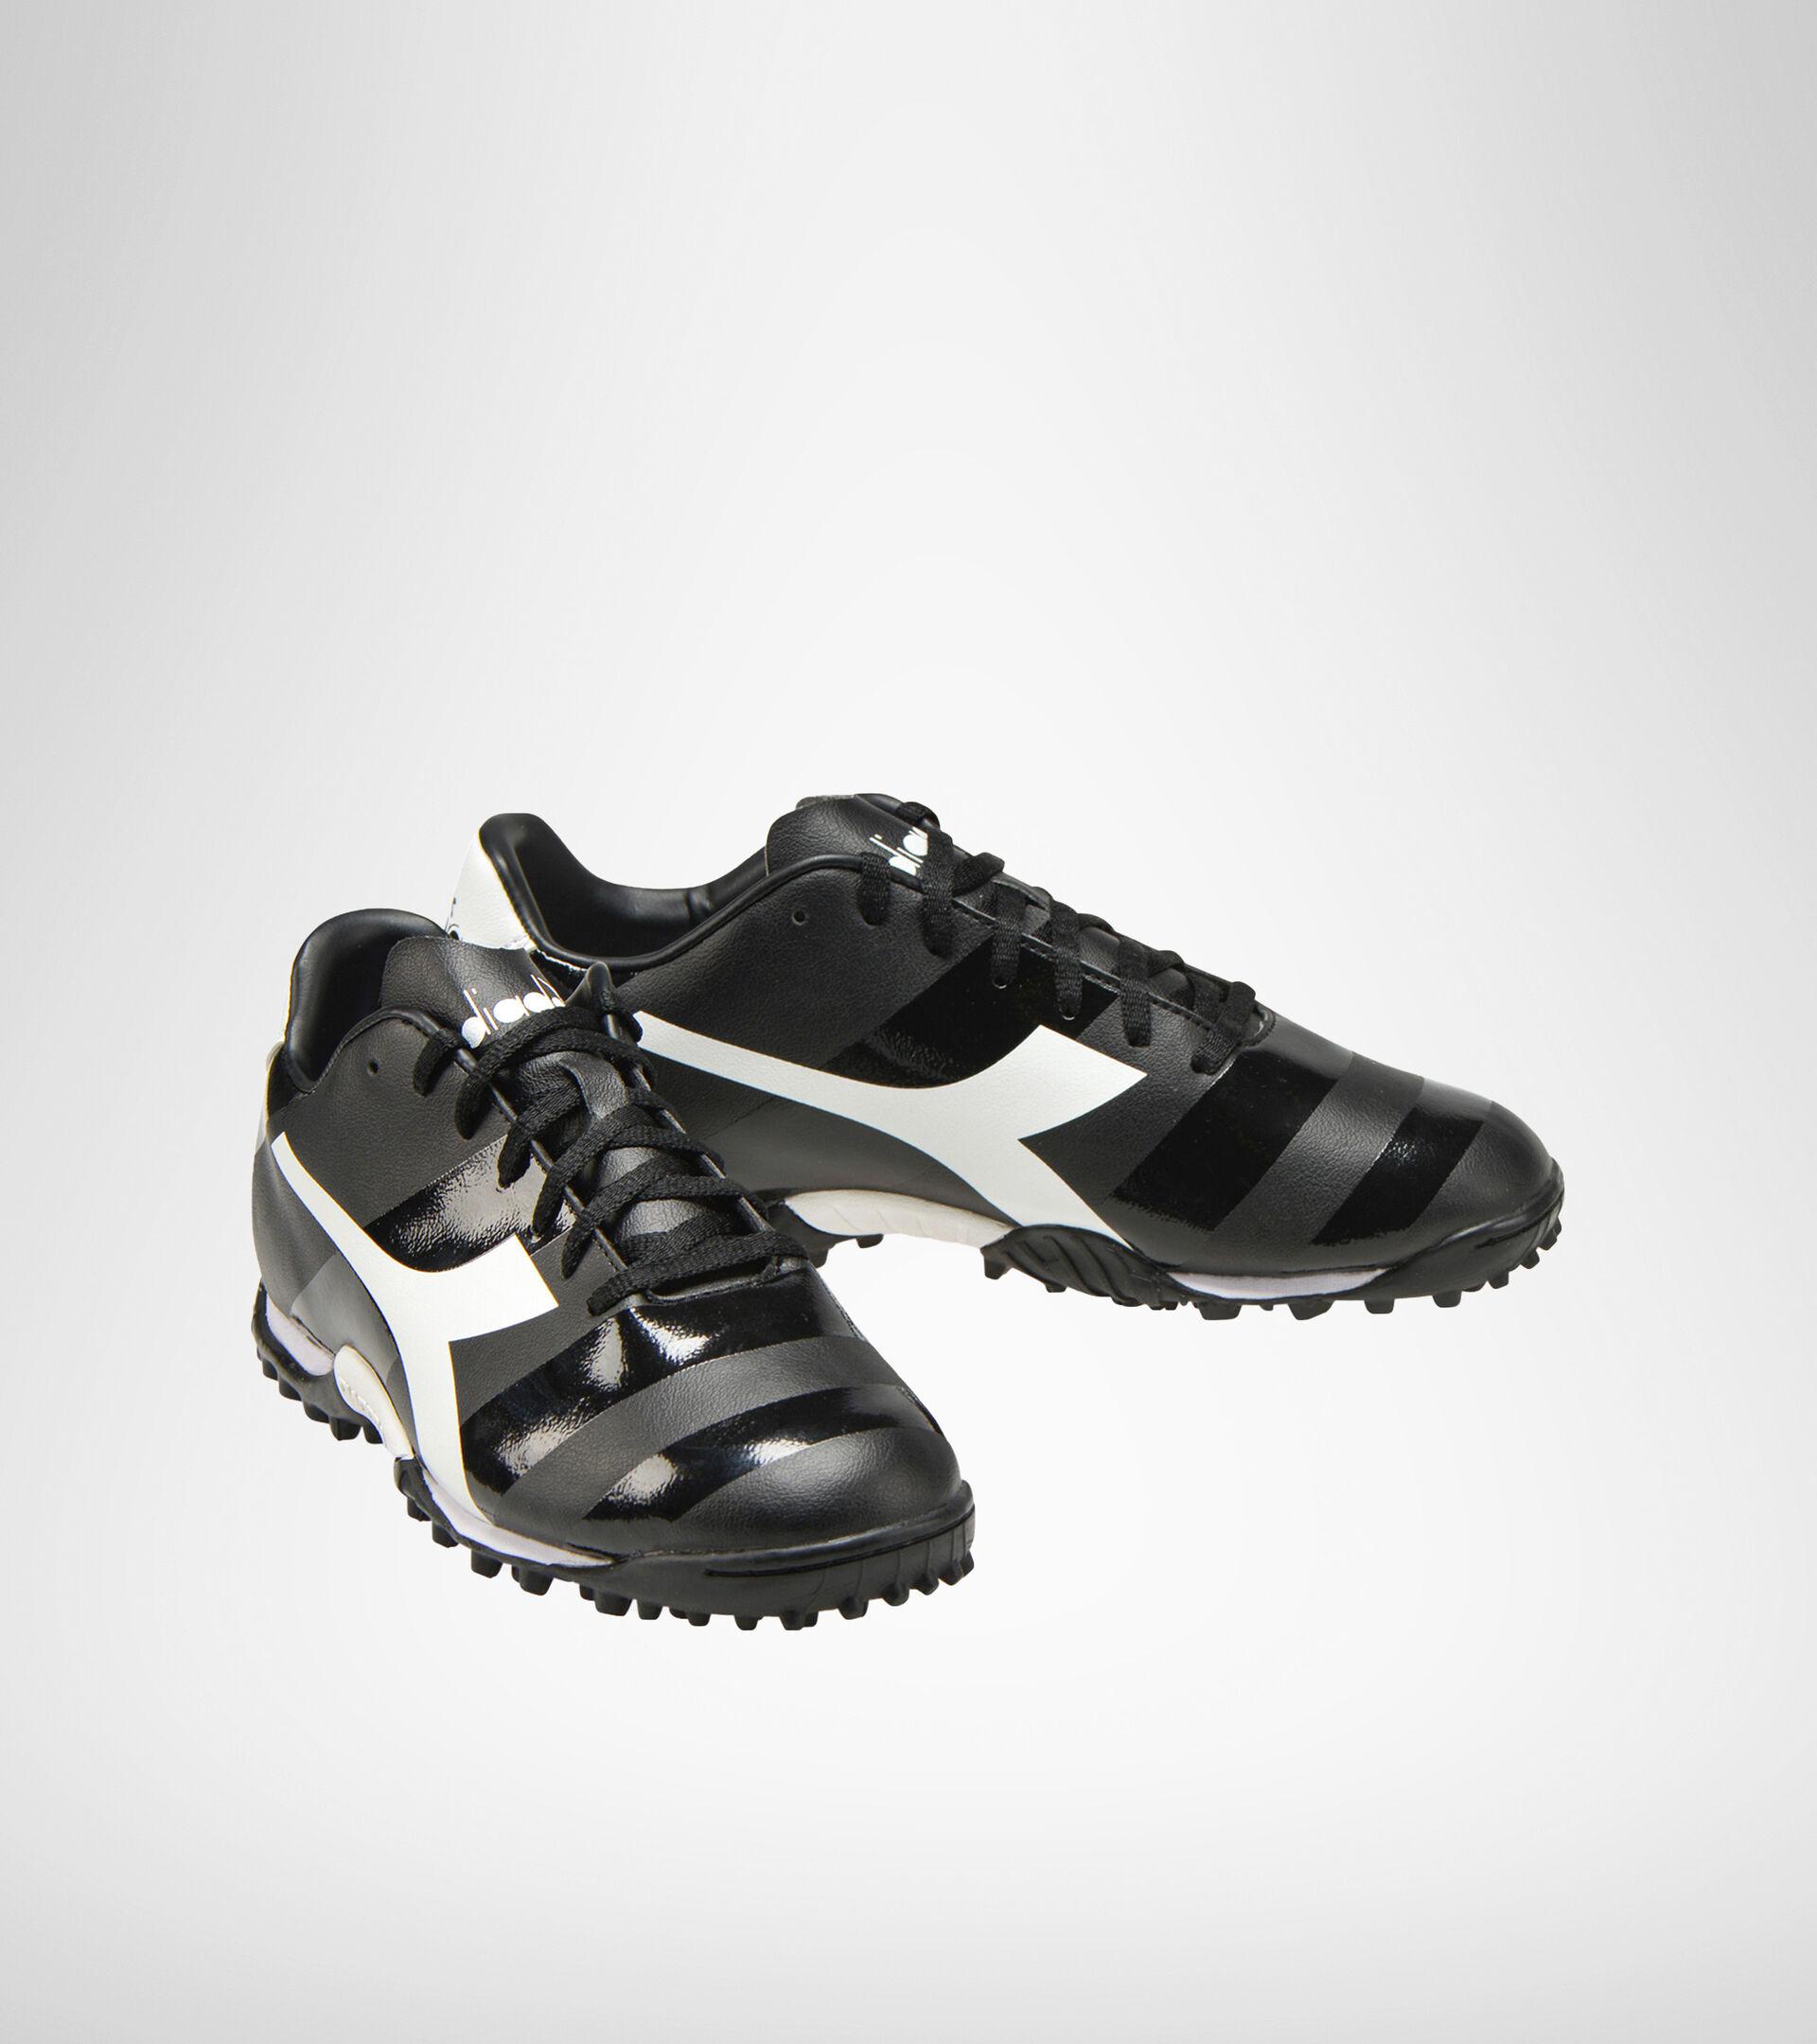 Chaussures de football pour terrains durs ou gazon synthétique RAPTOR R TF NERO/NERO/BIANCO - Diadora